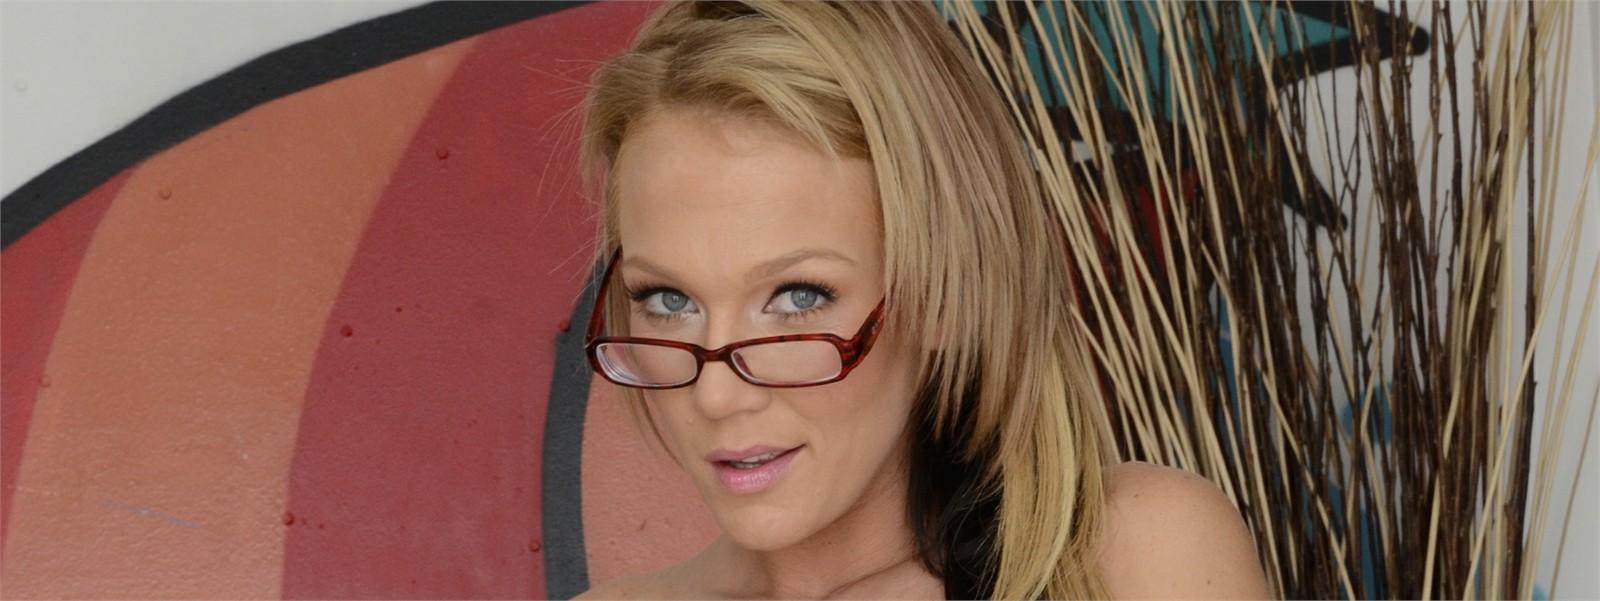 Nikki Sexx Hero Image